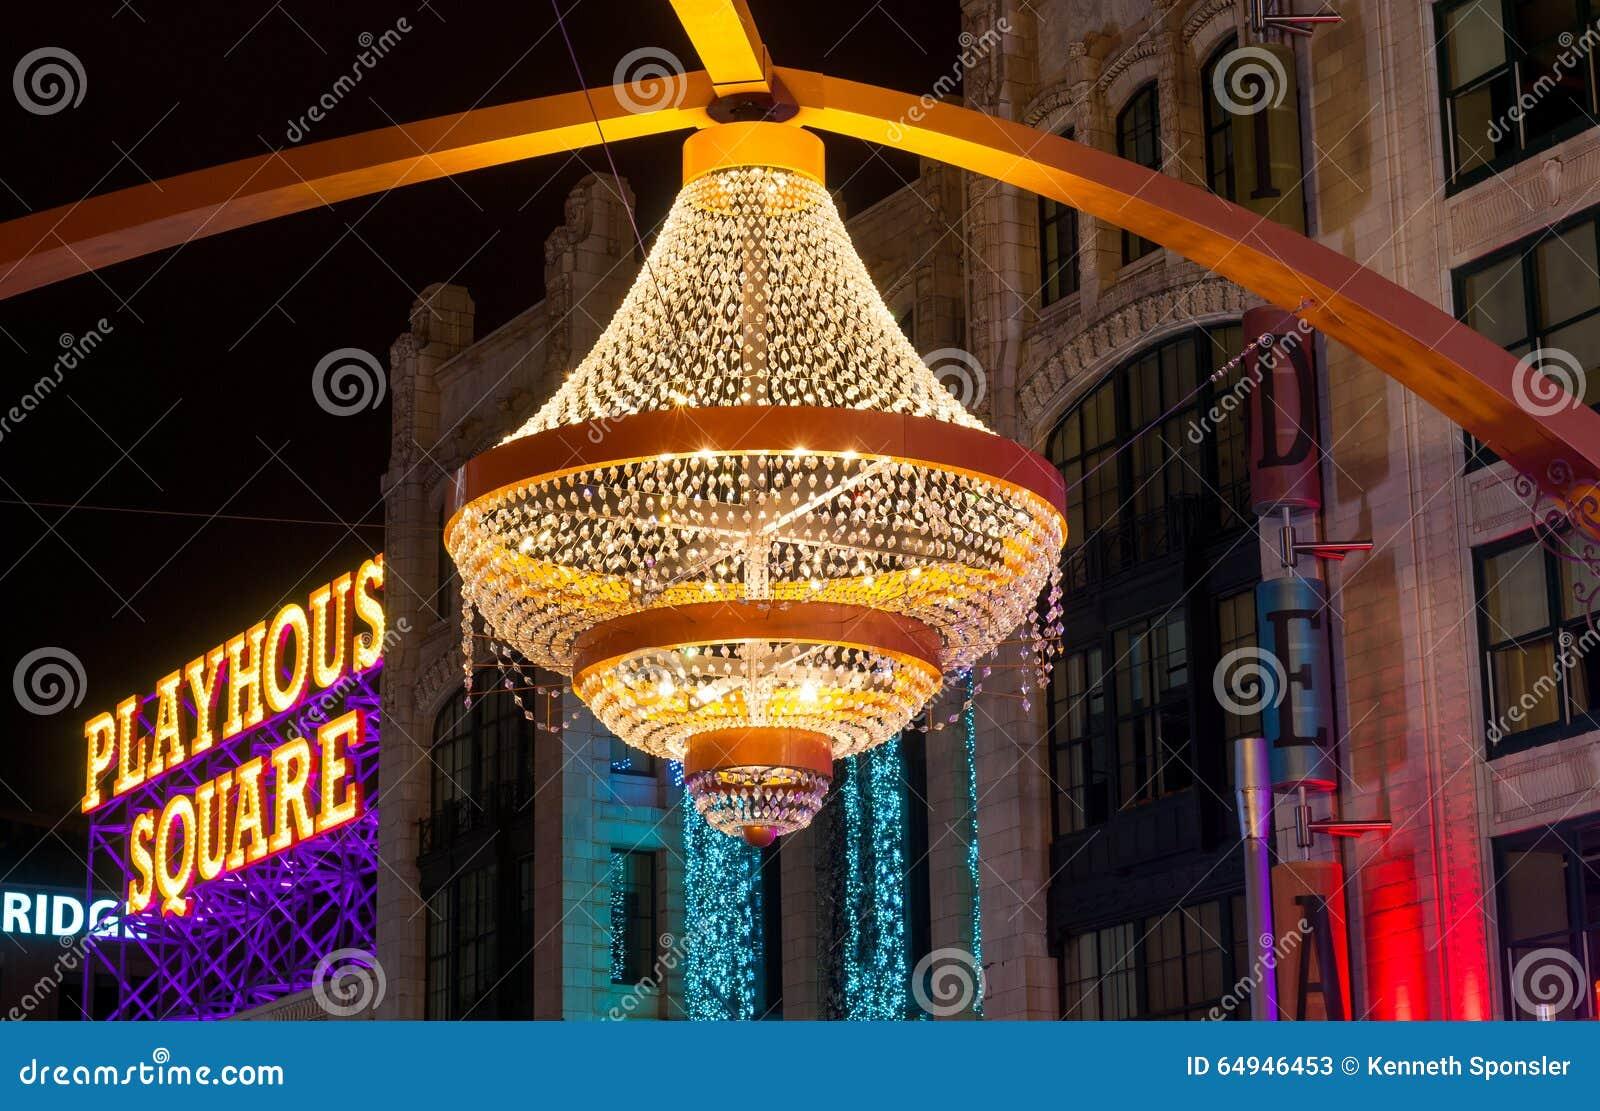 Chandelier - Playhouse Square - Cleveland, Ohio Stock Image ...